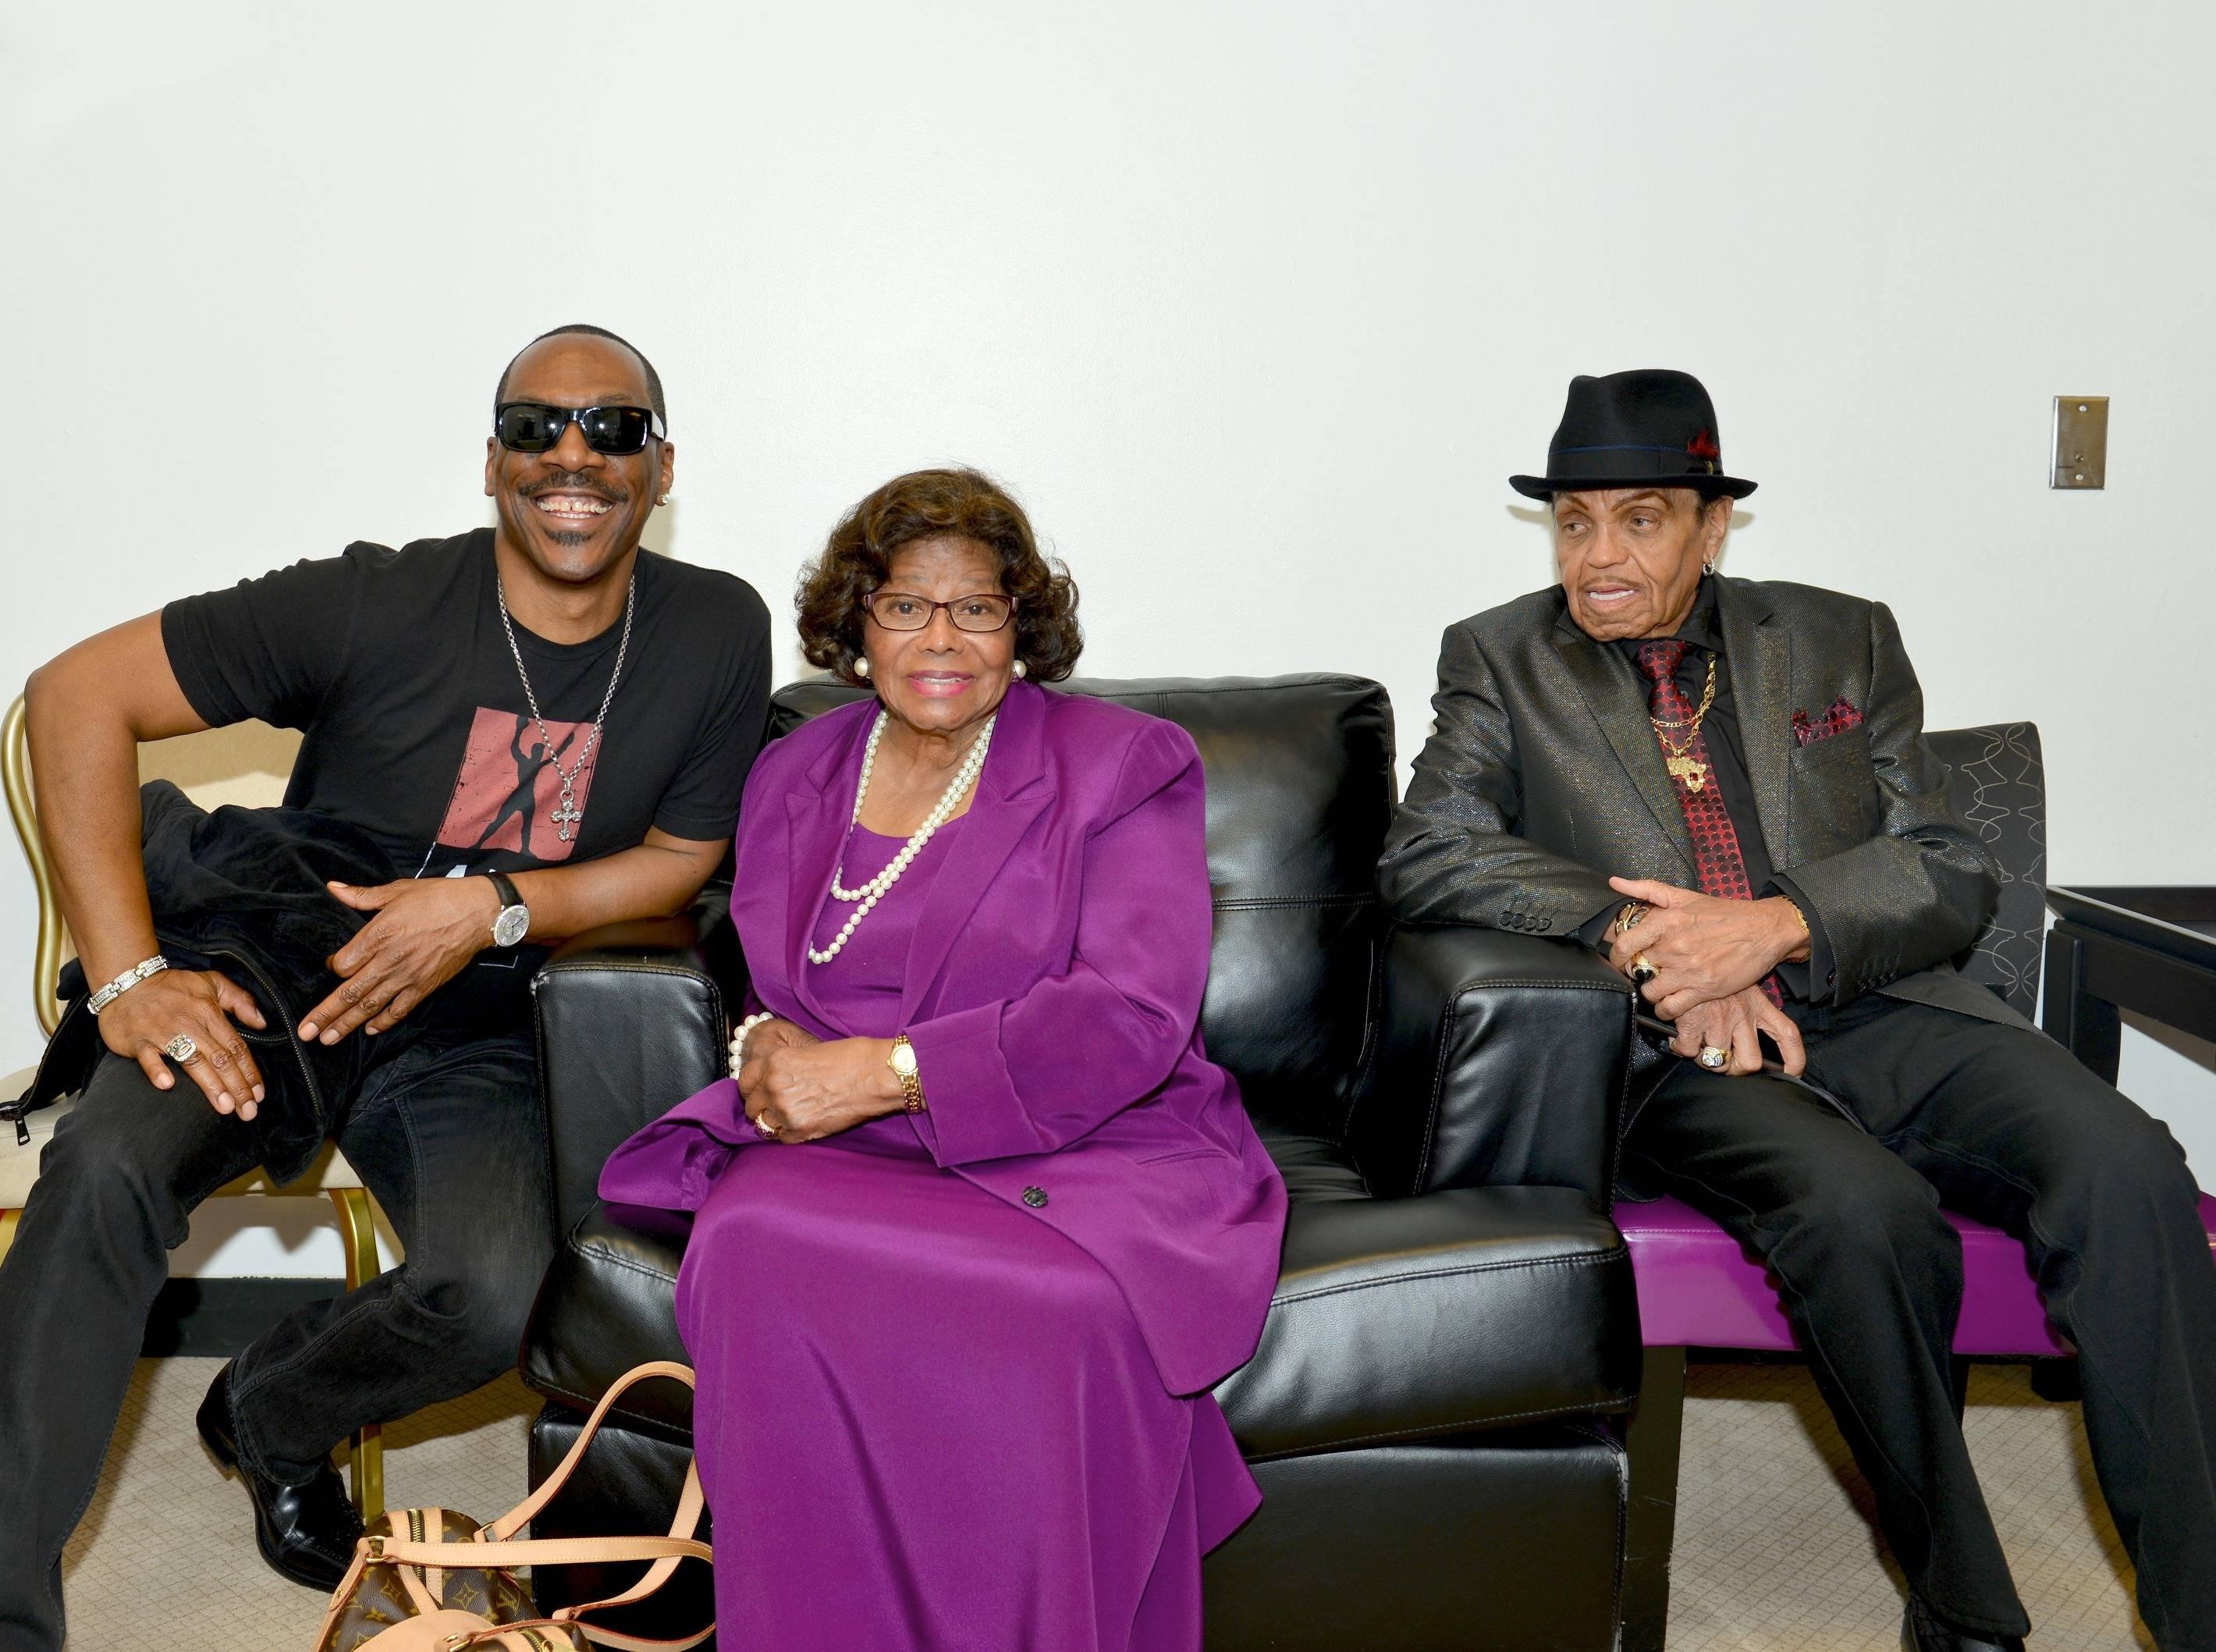 Eddie Murphy, Katherine Jackson and Joe Jackson – Photo credit Claude Van Heye